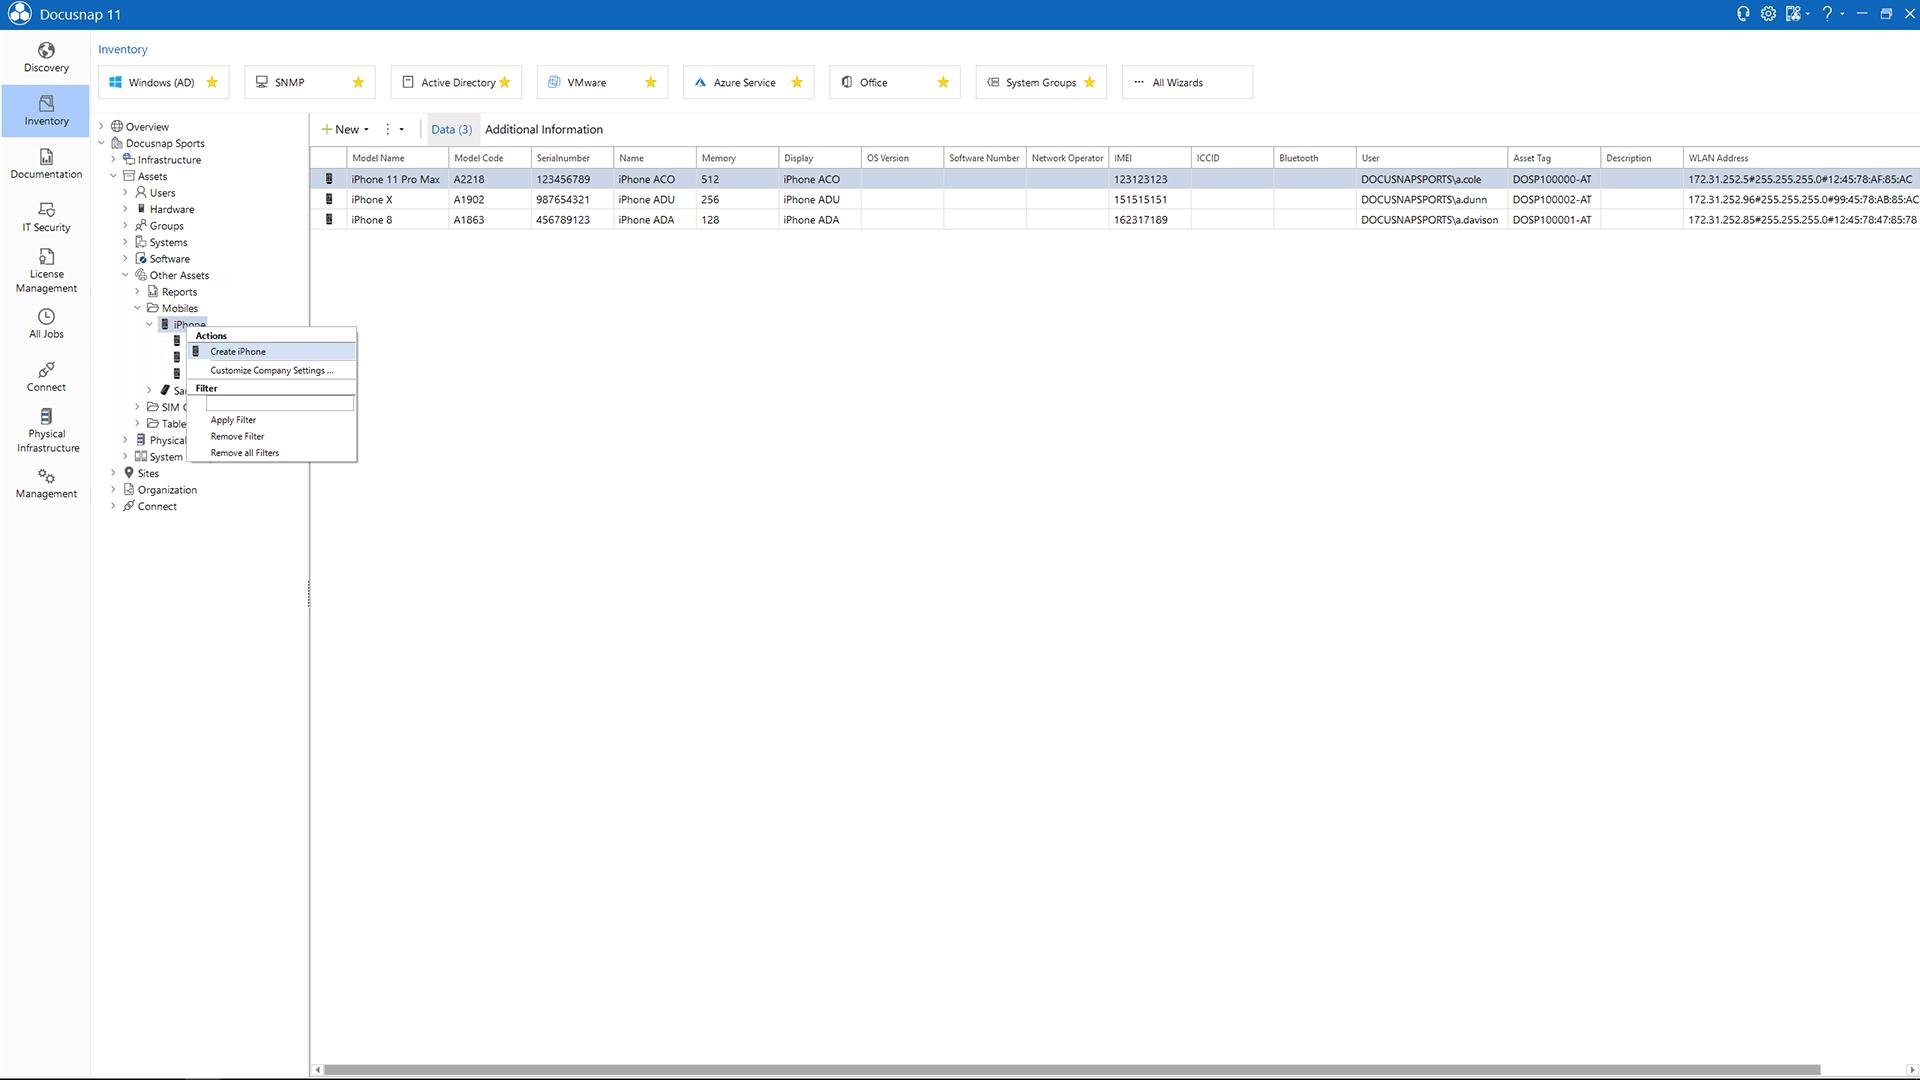 Screenshot: Creating IT Assets